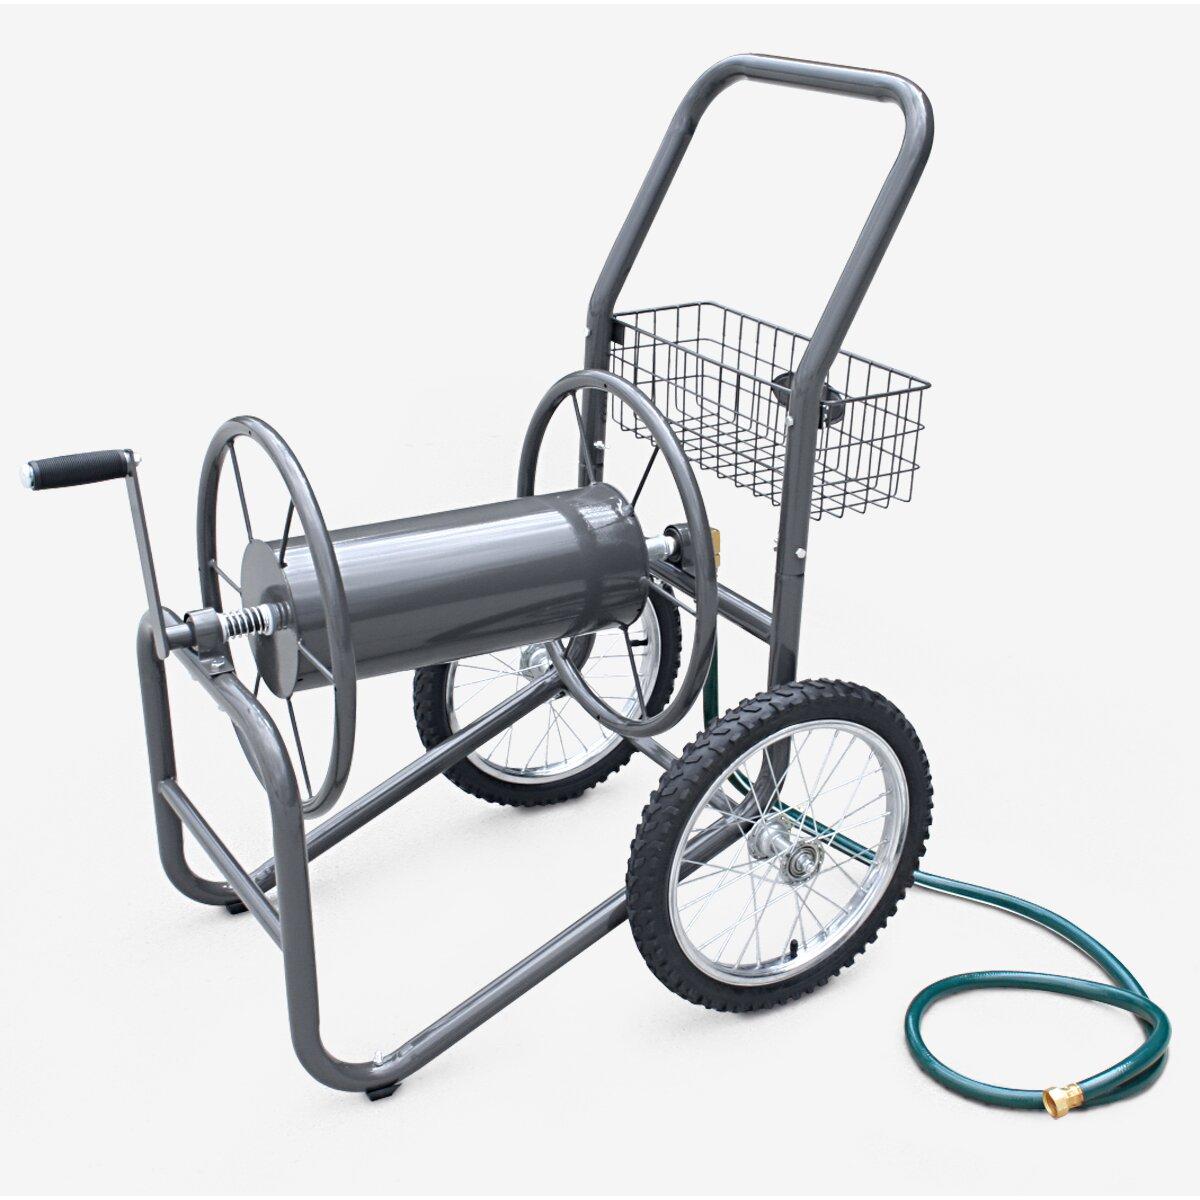 Liberty Garden Industrial 2 Wheel Hose Reel Cart & Reviews ...